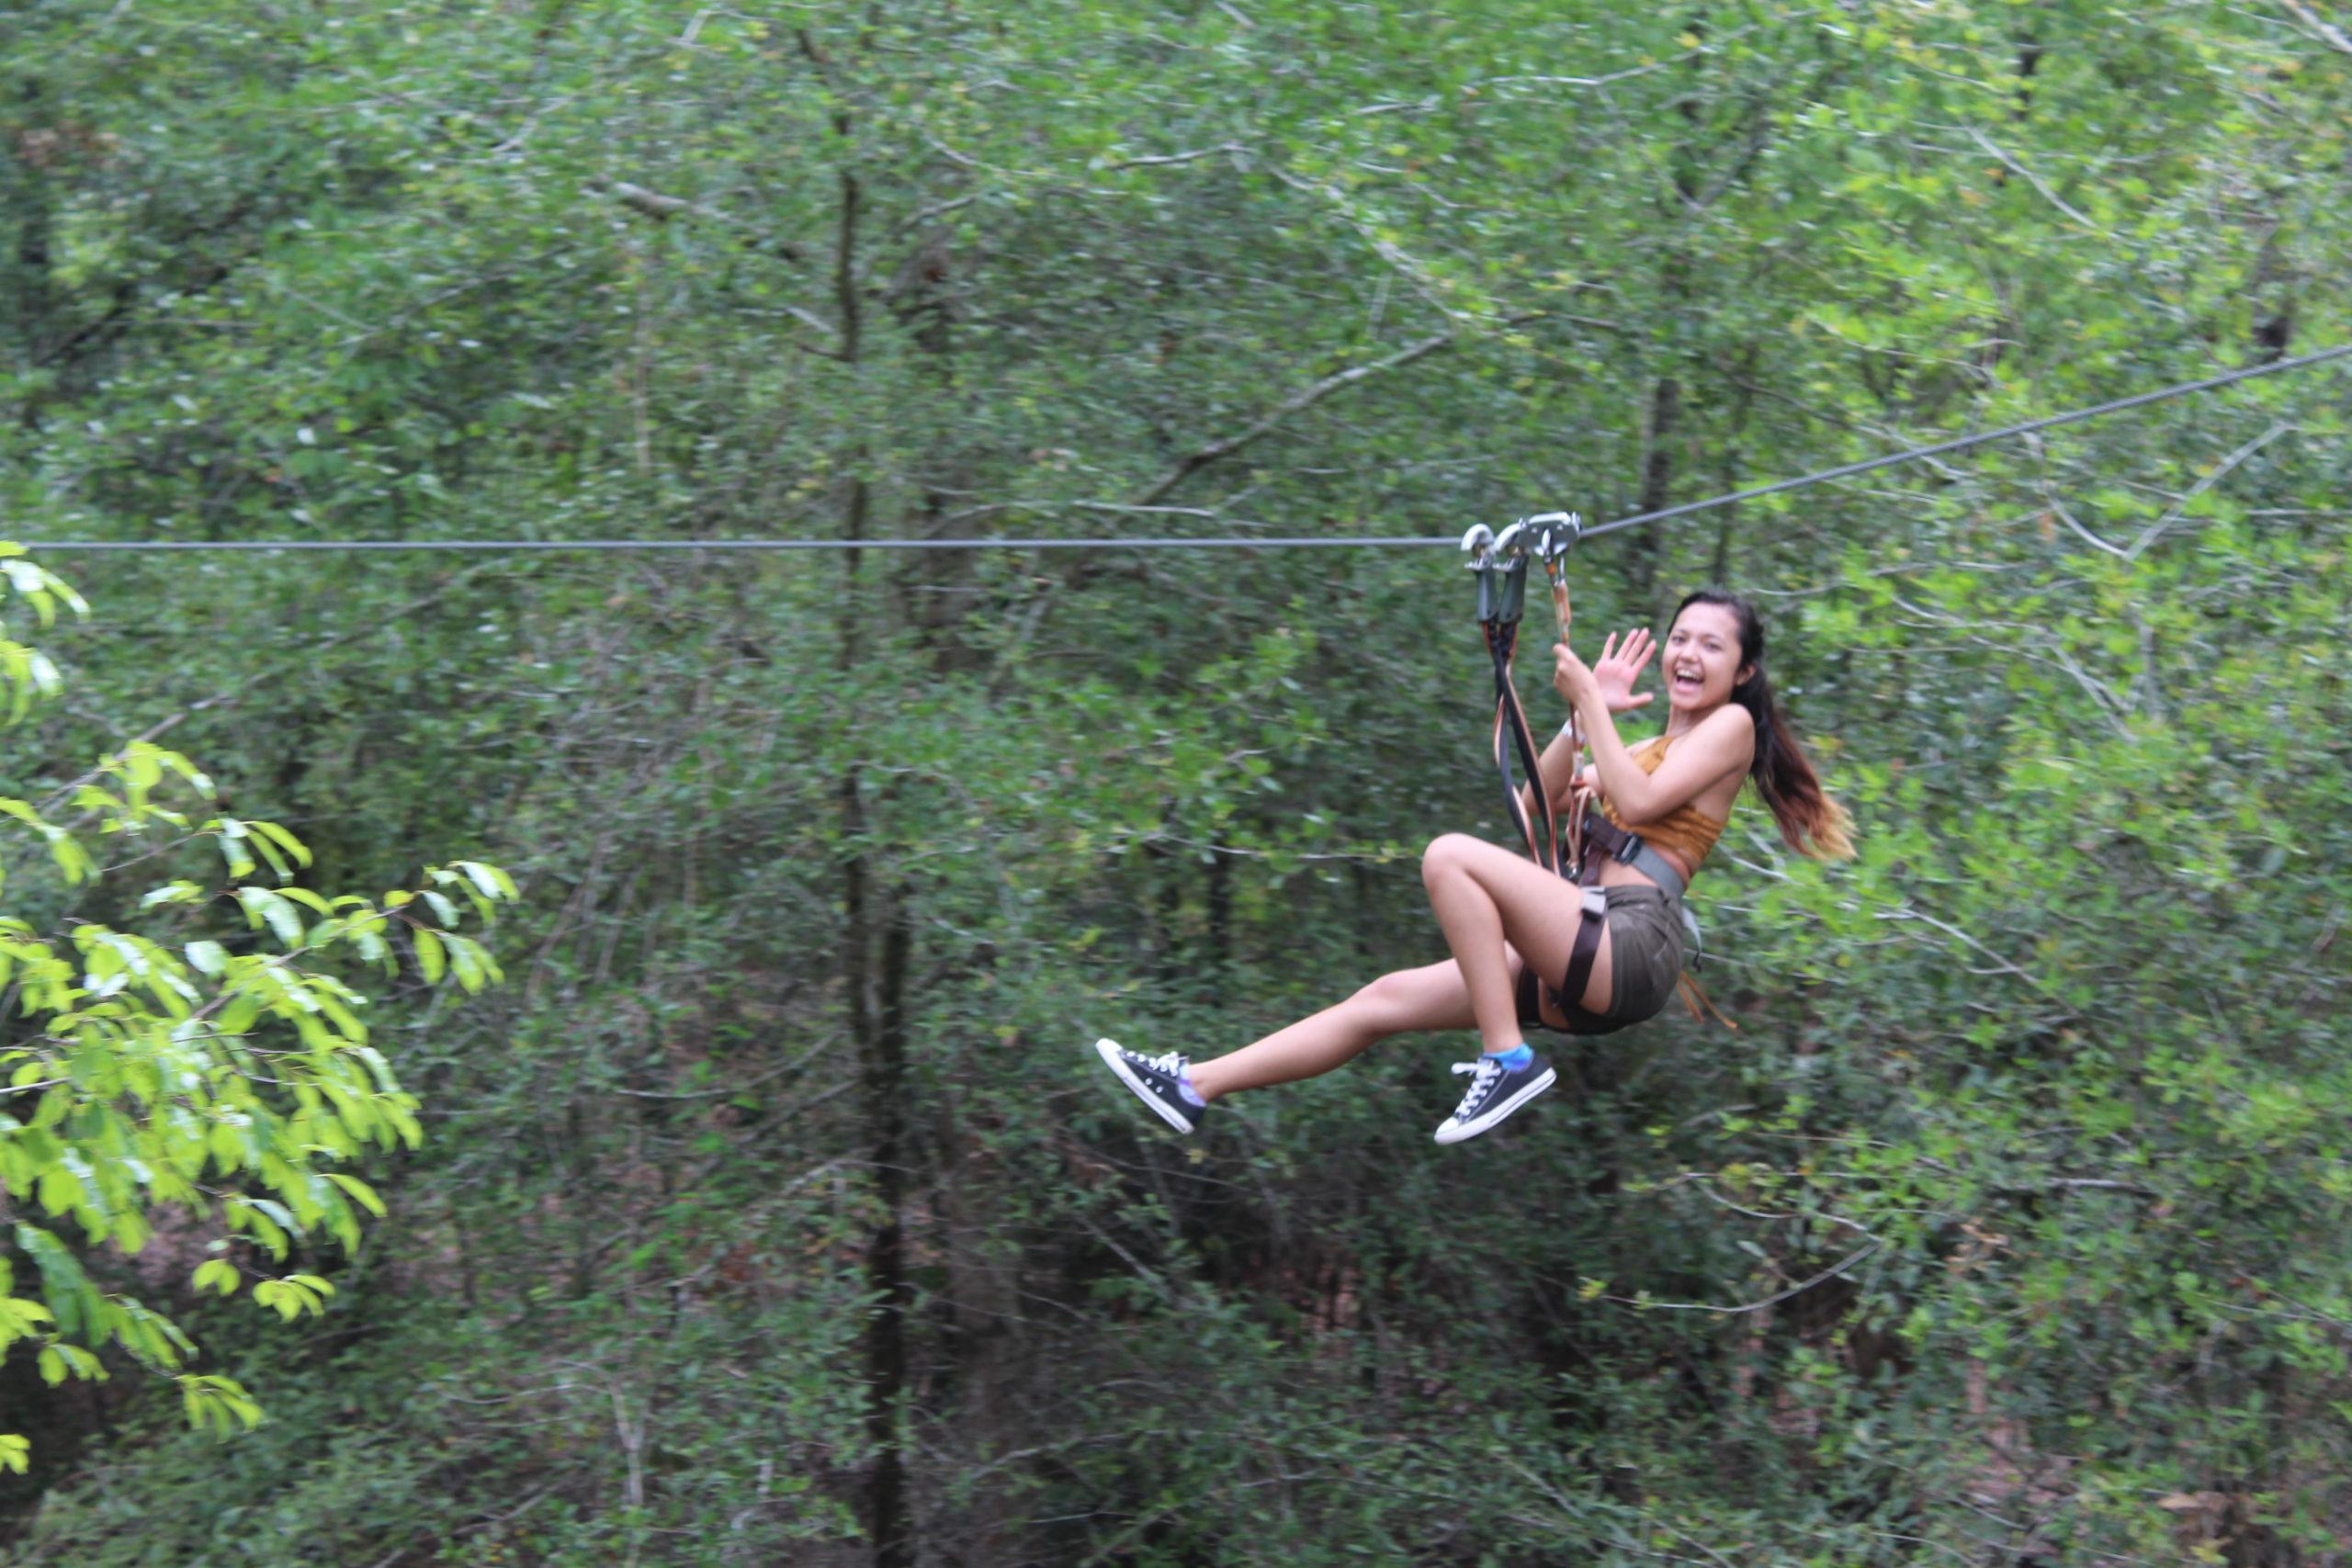 Woman ziplines through the trees at Orlando Tree Trek Adventure Park.